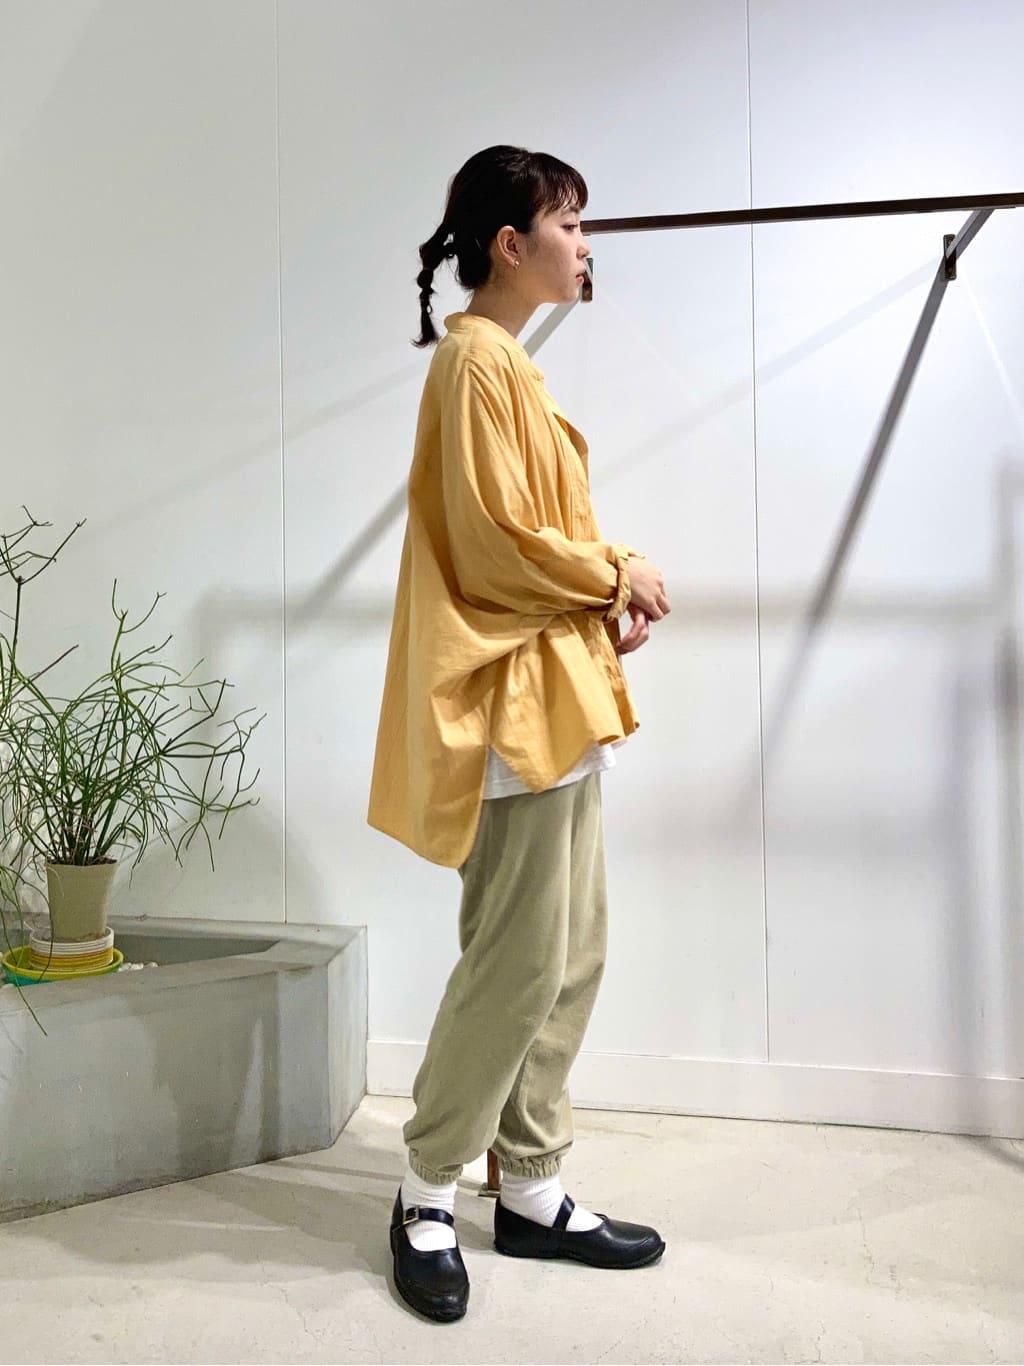 l'atelier du savon 名古屋栄路面 身長:161cm 2021.09.10